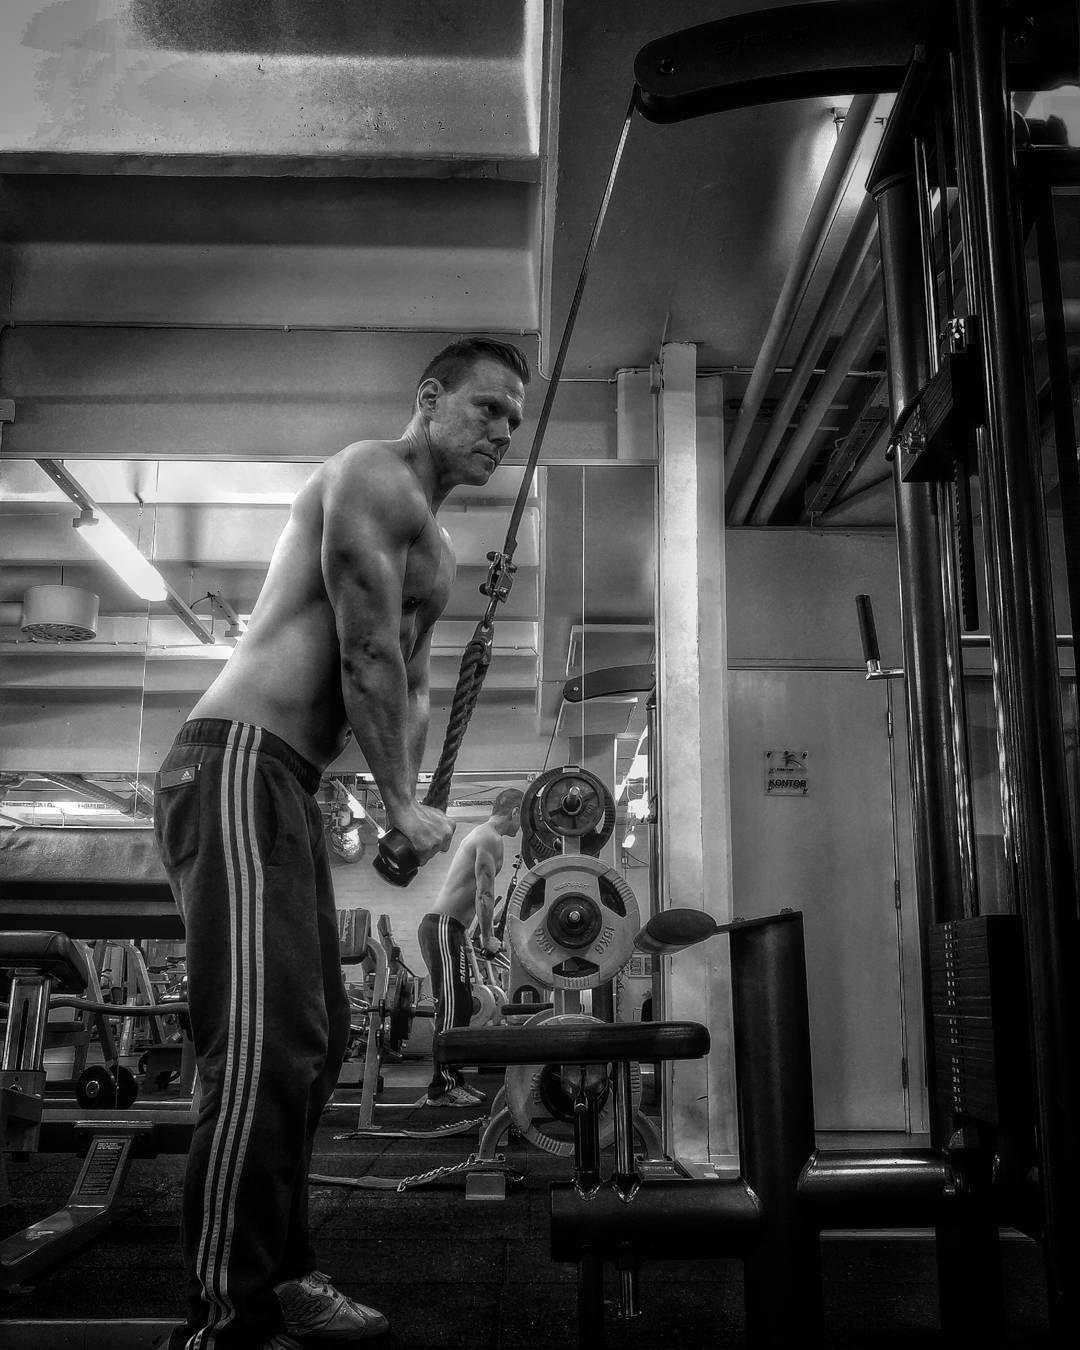 Standing highrep tricepspushdowns #morgonen #morning #training #träning #weightlifting #strenghttraining #pwo #selfiemood #gym #gymselfie #gymlife #fitnesslife #fitnesslifestyle #fitness #gymlife #styrketräning #styrkelyft #Sweden #sverige #norden #Scandinavia #diet #physique #fatloss #shredding #selfie by john_fblog